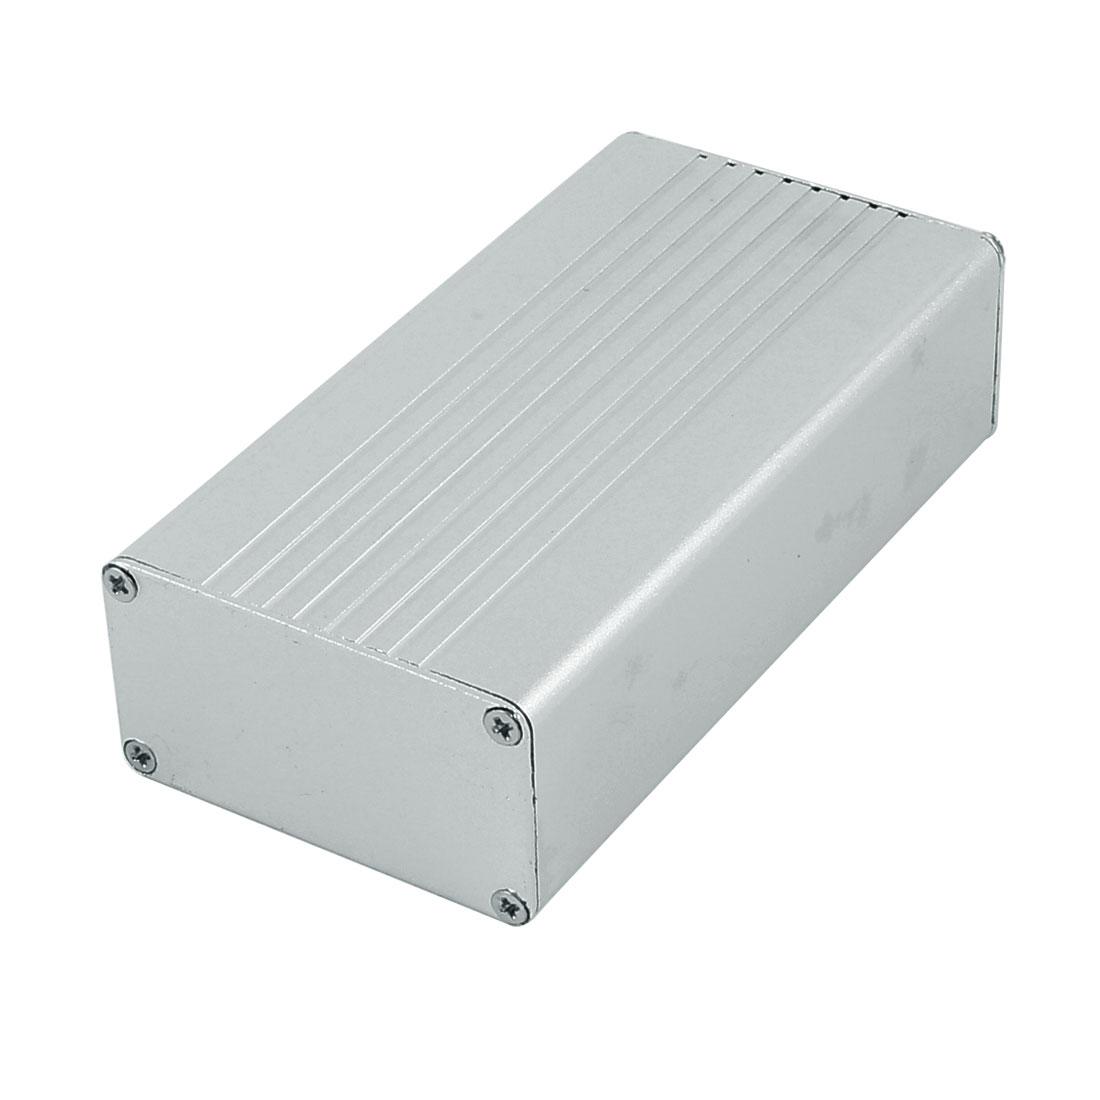 108 x 55 x 30mm Multi-purpose Extruded Aluminum Enclosure Box Silver Tone